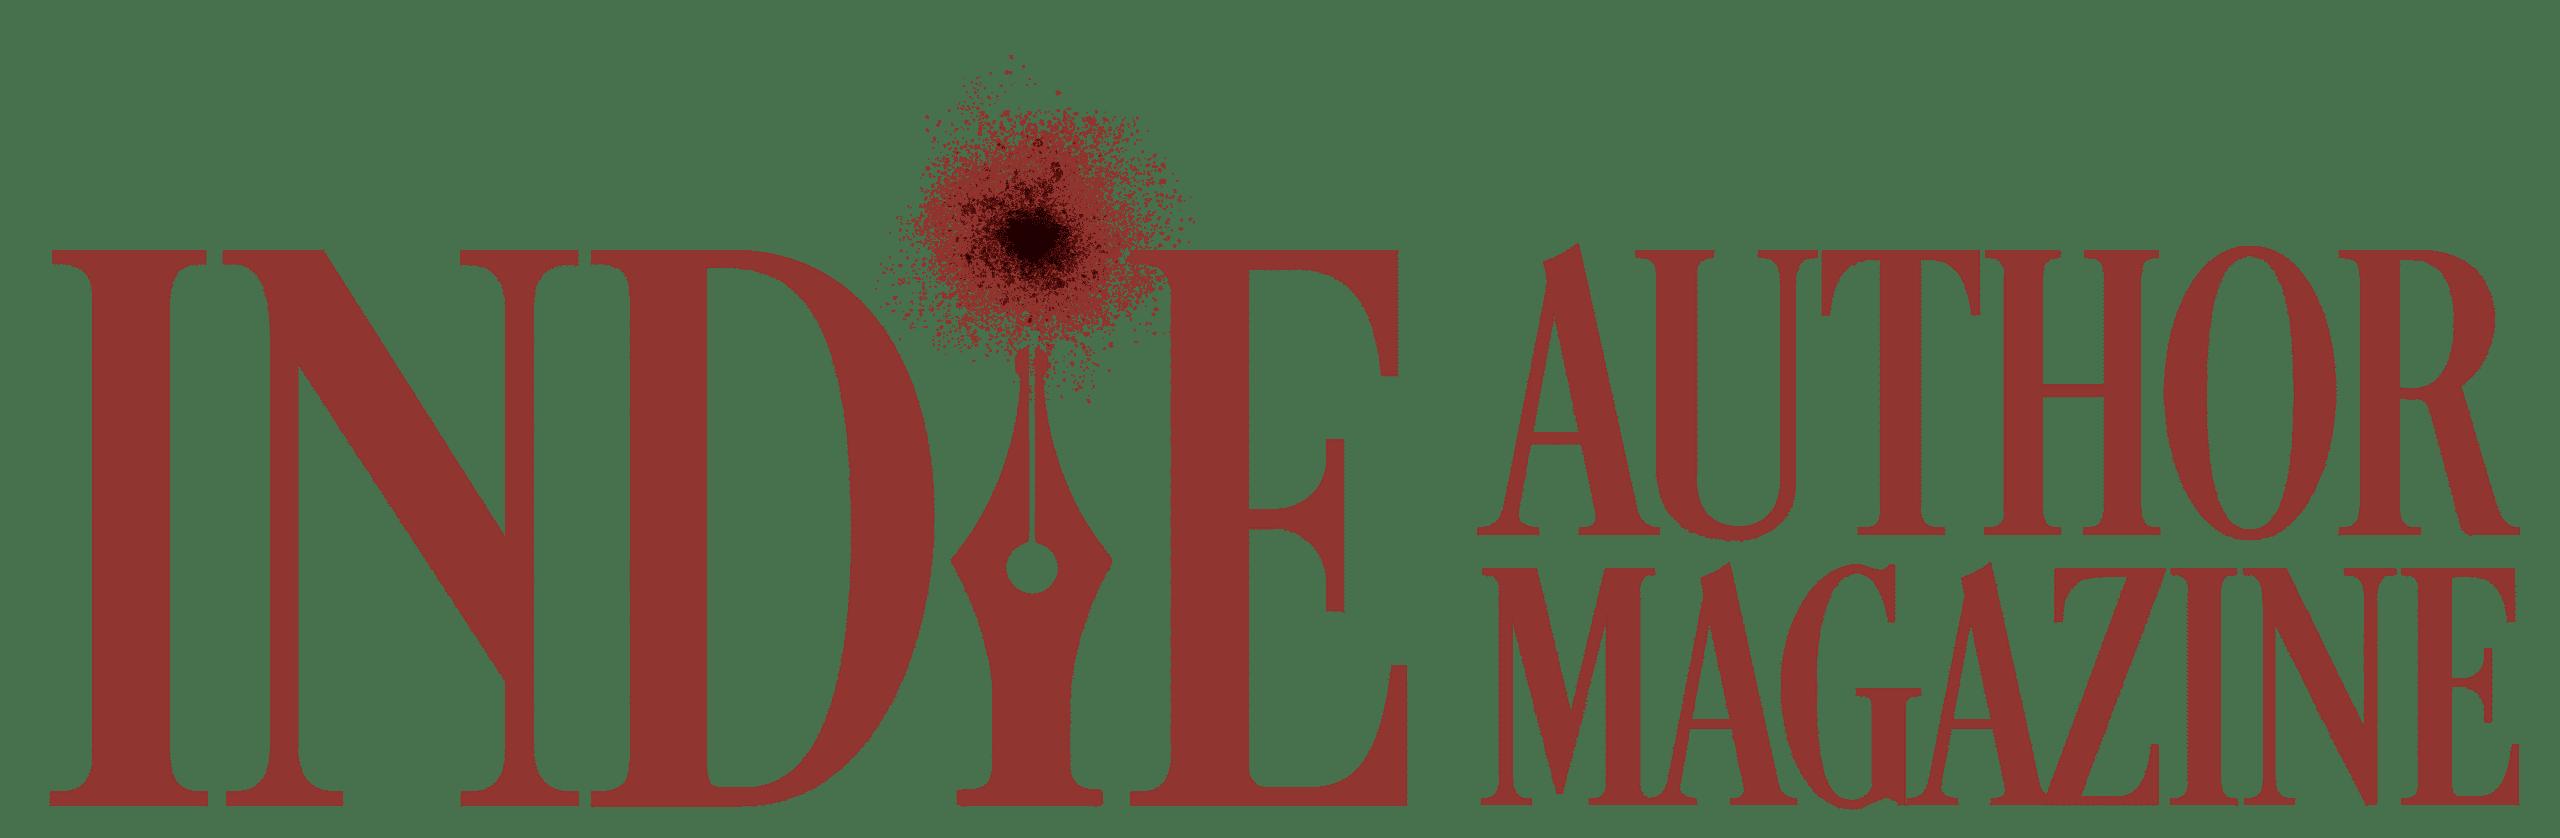 Indie Author Magazine Logo